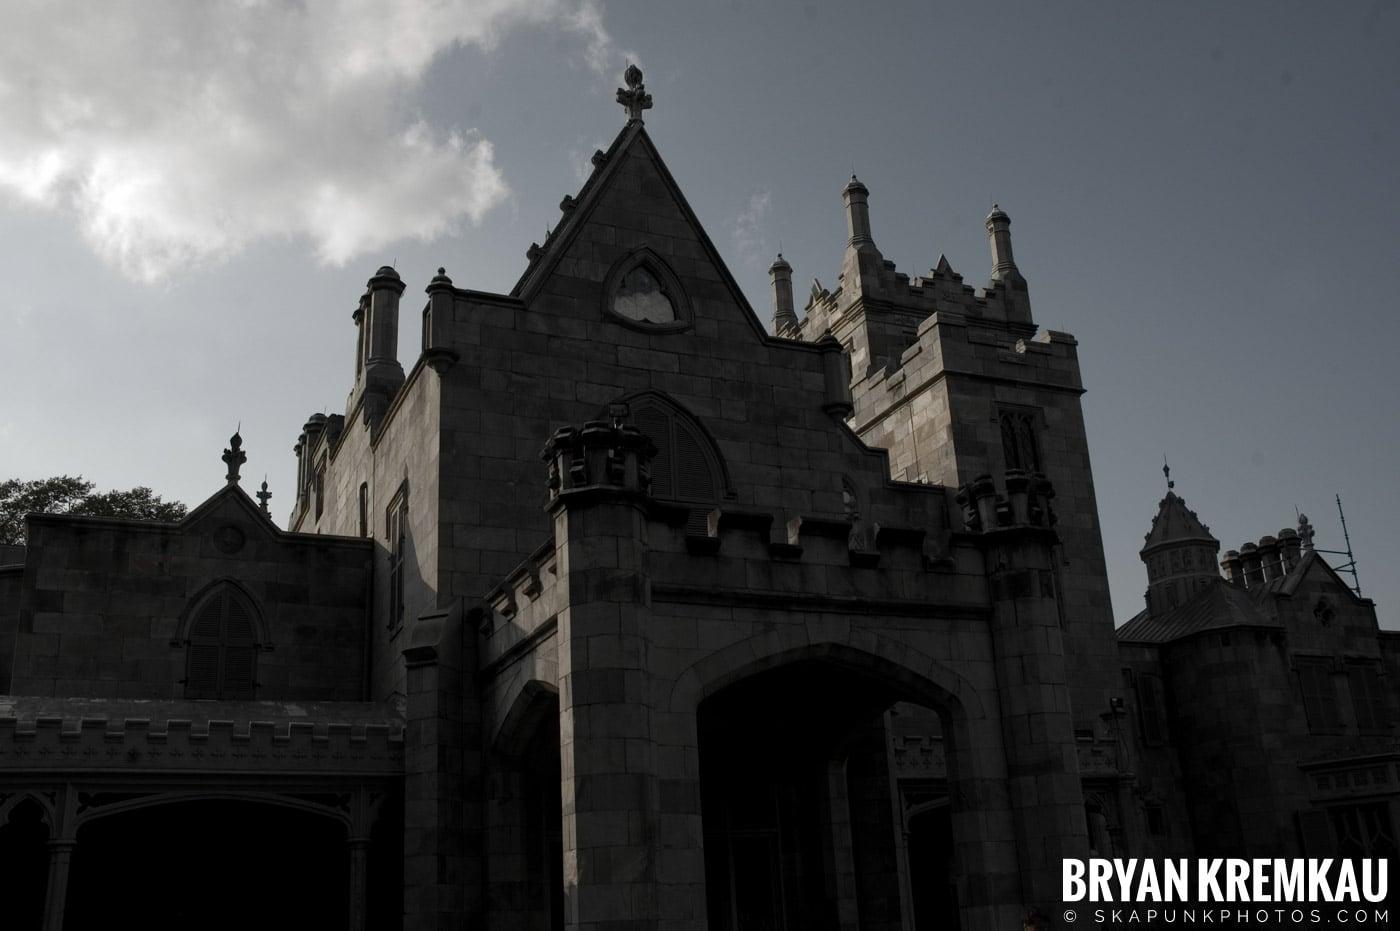 The Old Dutch Church & Lyndhurst Mansion @ Sleepy Hollow/Tarrytown, NY - 10.20.07 (11)